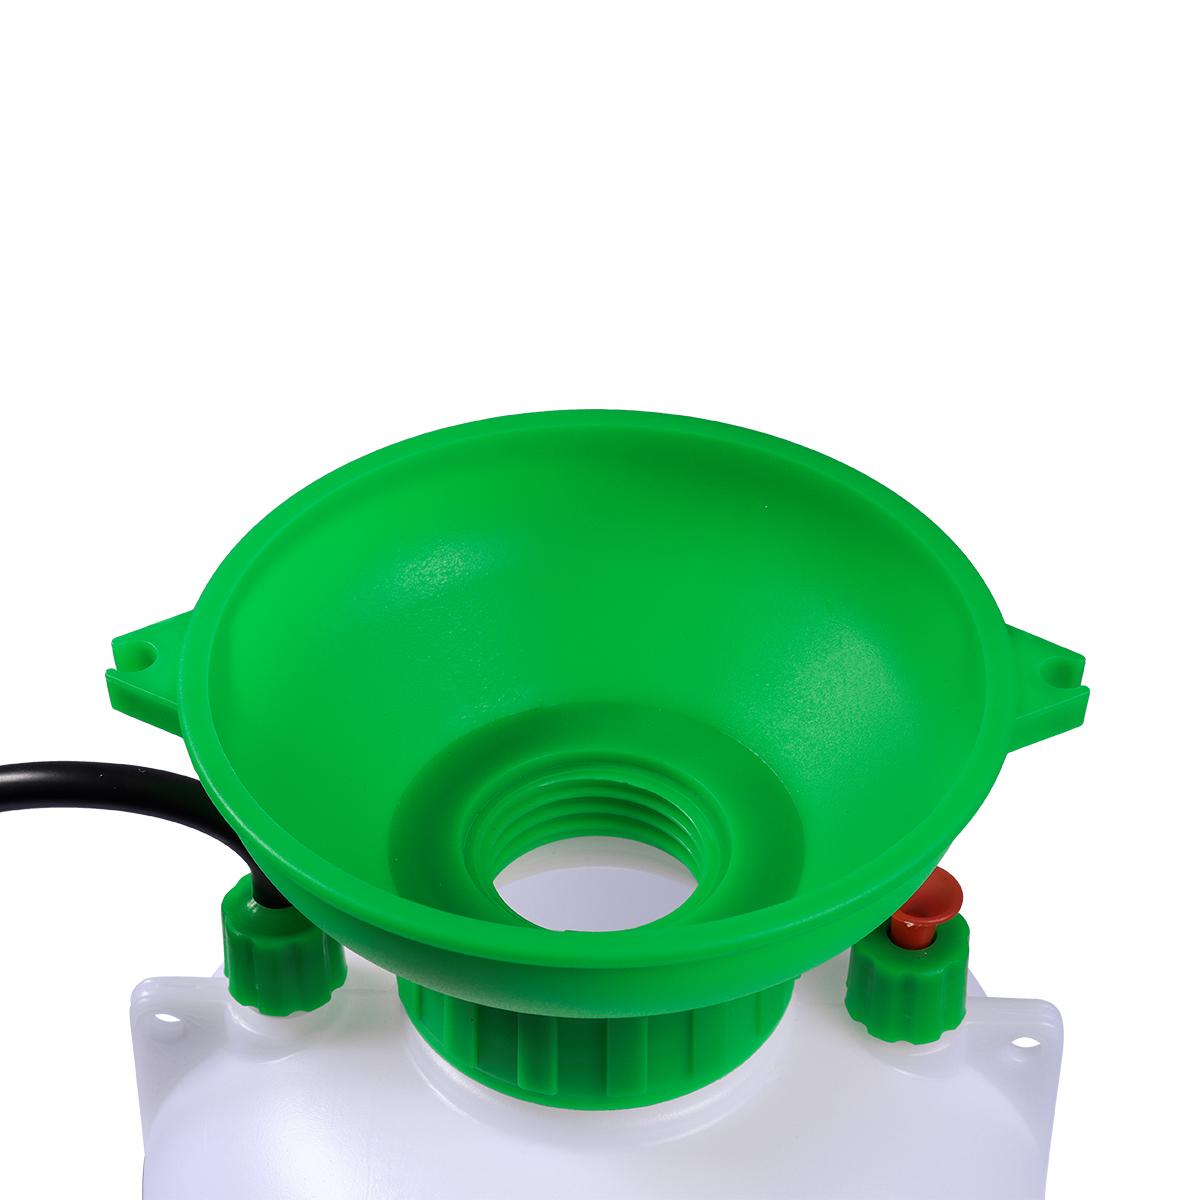 Pulverizador Pressão Acumulada 5 Litros SuperAgri SAPPA5L + Pulverizador Pressão Acumulada 8 Litros SuperAgri SAPPA8L